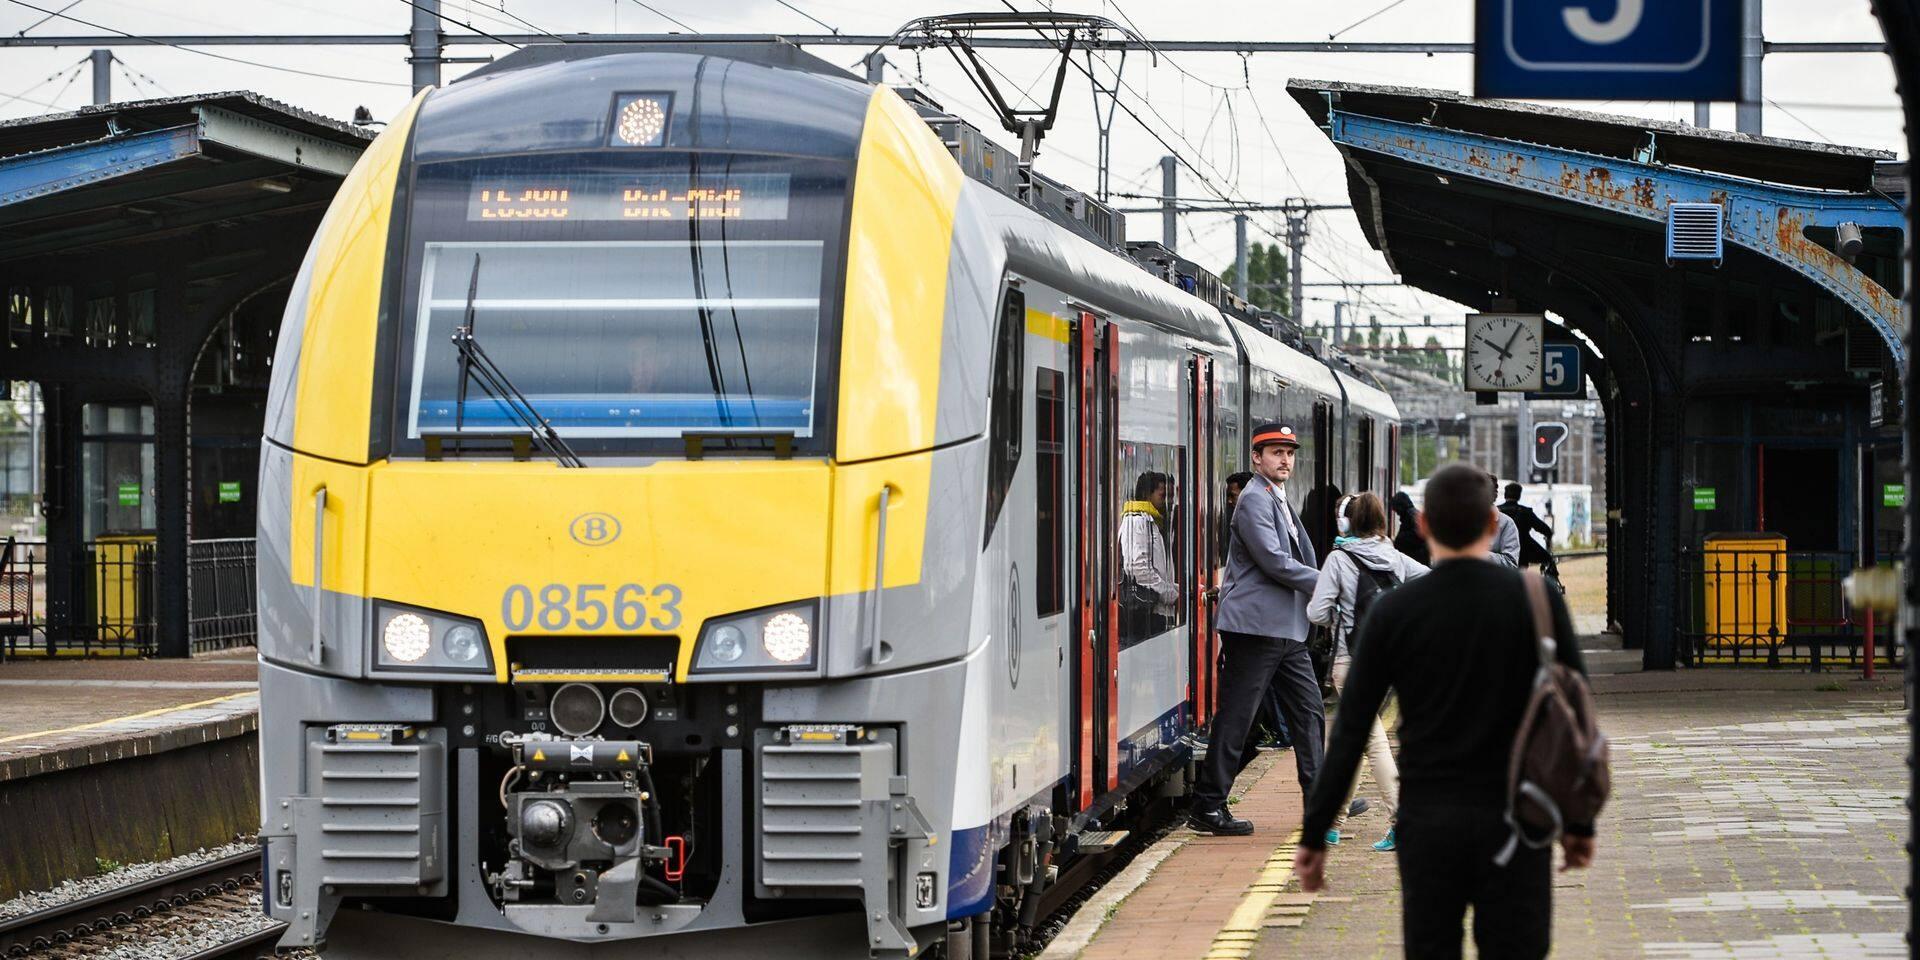 Circulation des trains interrompue entre Bruxelles-Midi et Bruxelles-Nord: des retards et suppressions possibles